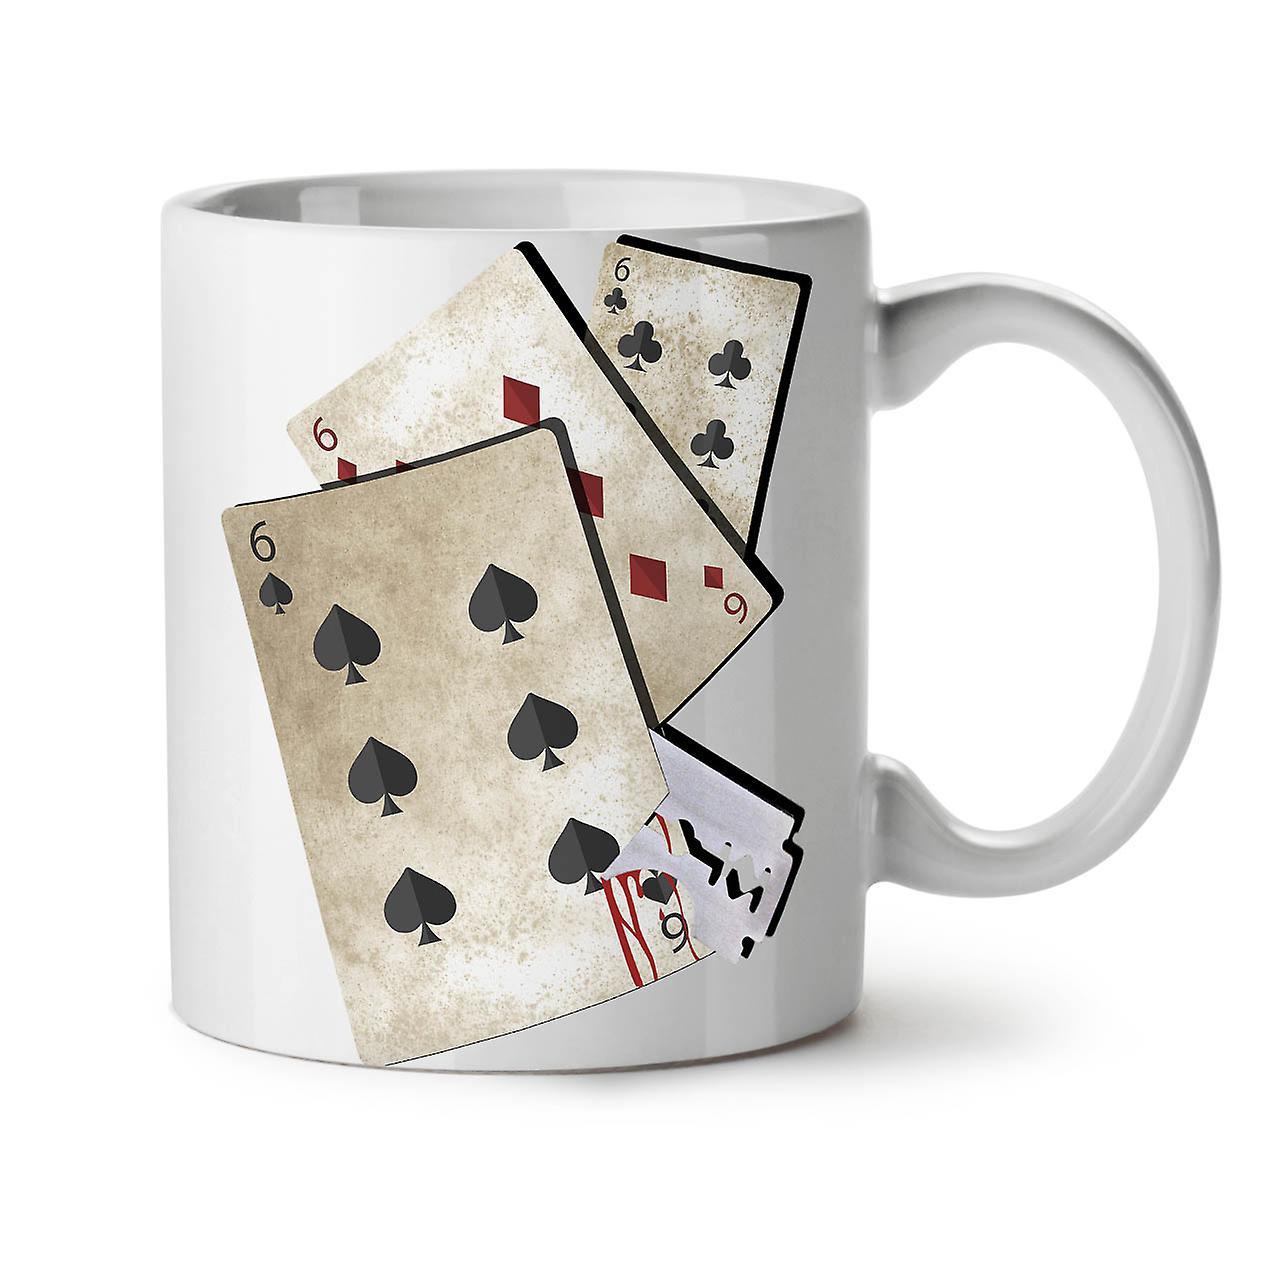 Gamble New Coffee Cards Ceramic 666 OzWellcoda White Tea 11 Razor Mug rdhsQtBCx